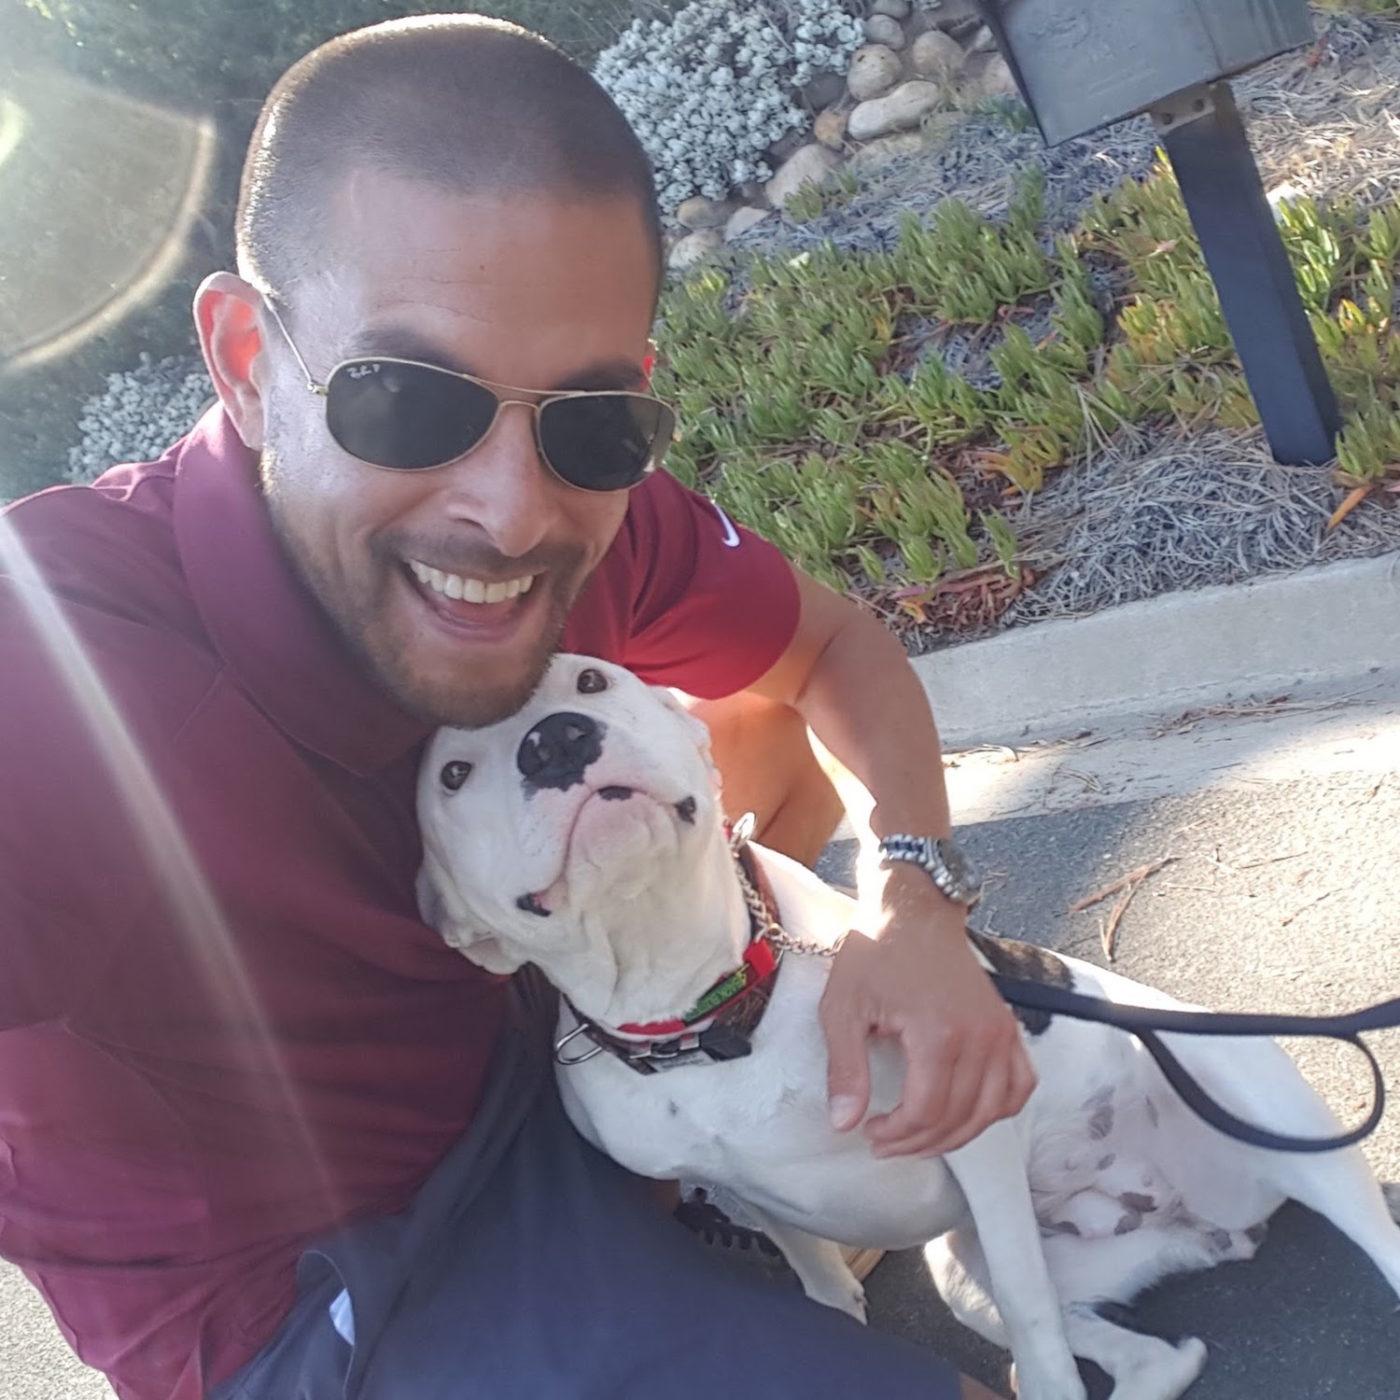 #doglove #masterdogtrainer #puppytraining #dogsofbarkbusters